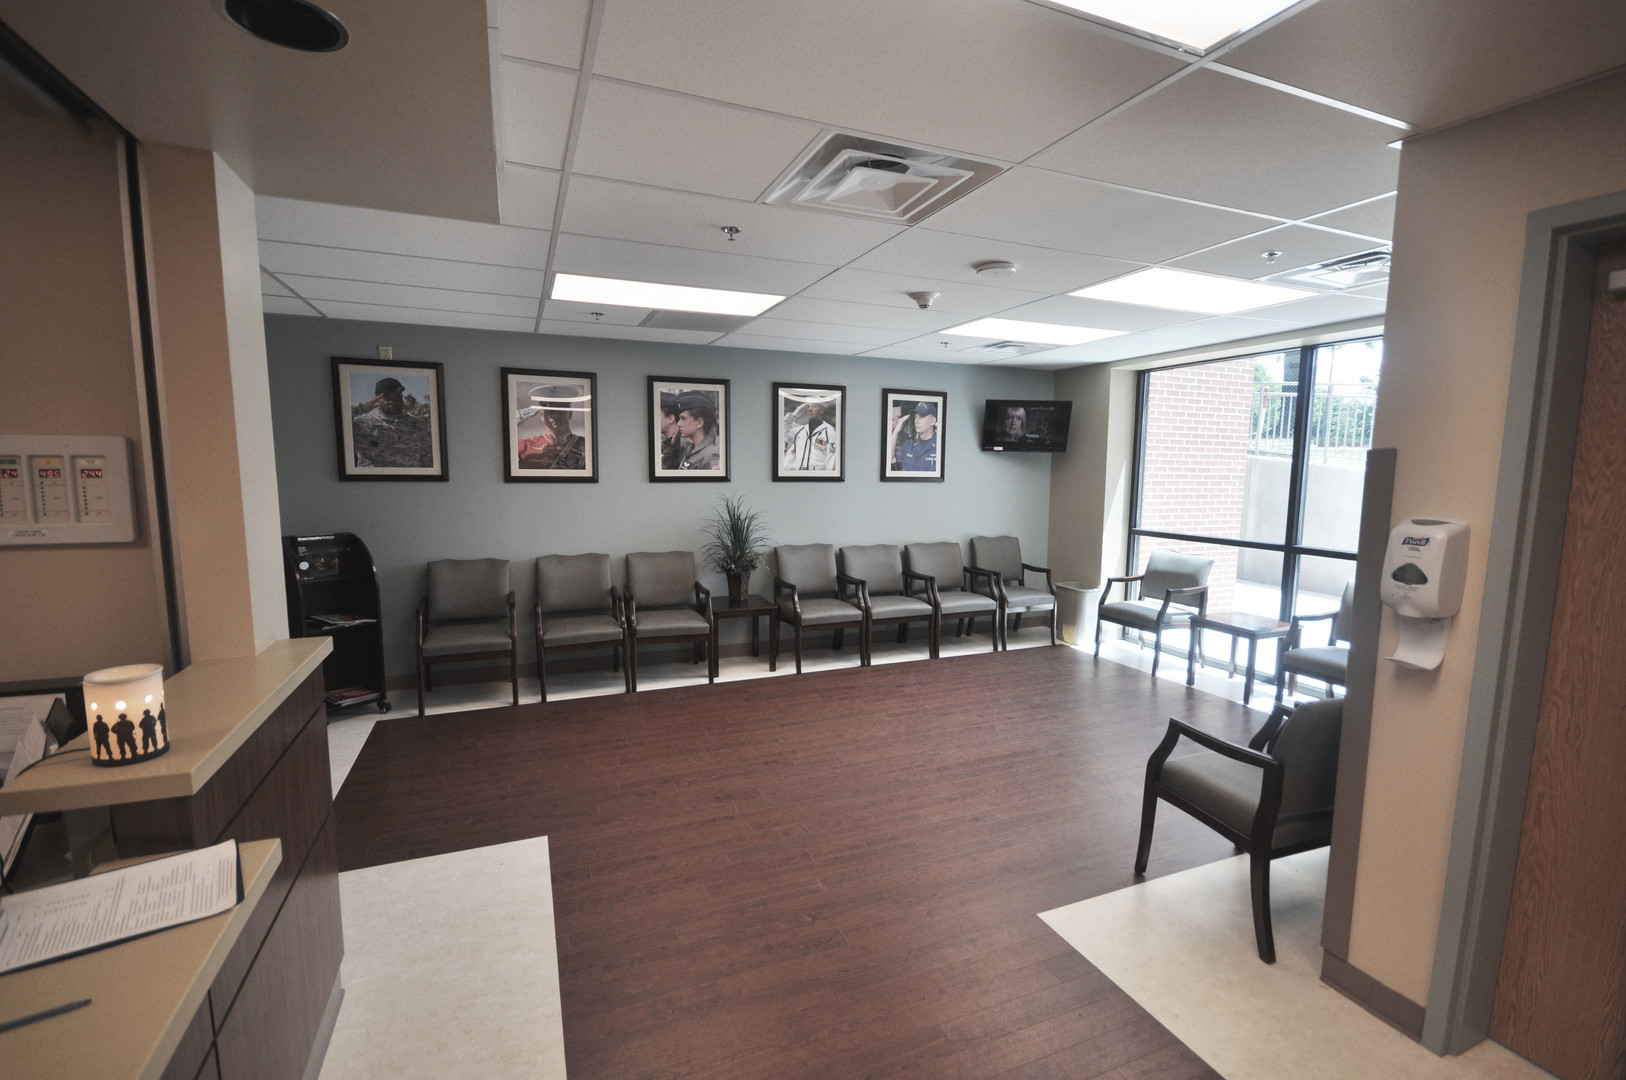 MRI, suite, addition, VA, medical, center, muskogee, oklahoma, magnetic, resonance, imaging, addition, federal, healthcare, renovations, expansion, construction, Spur, design